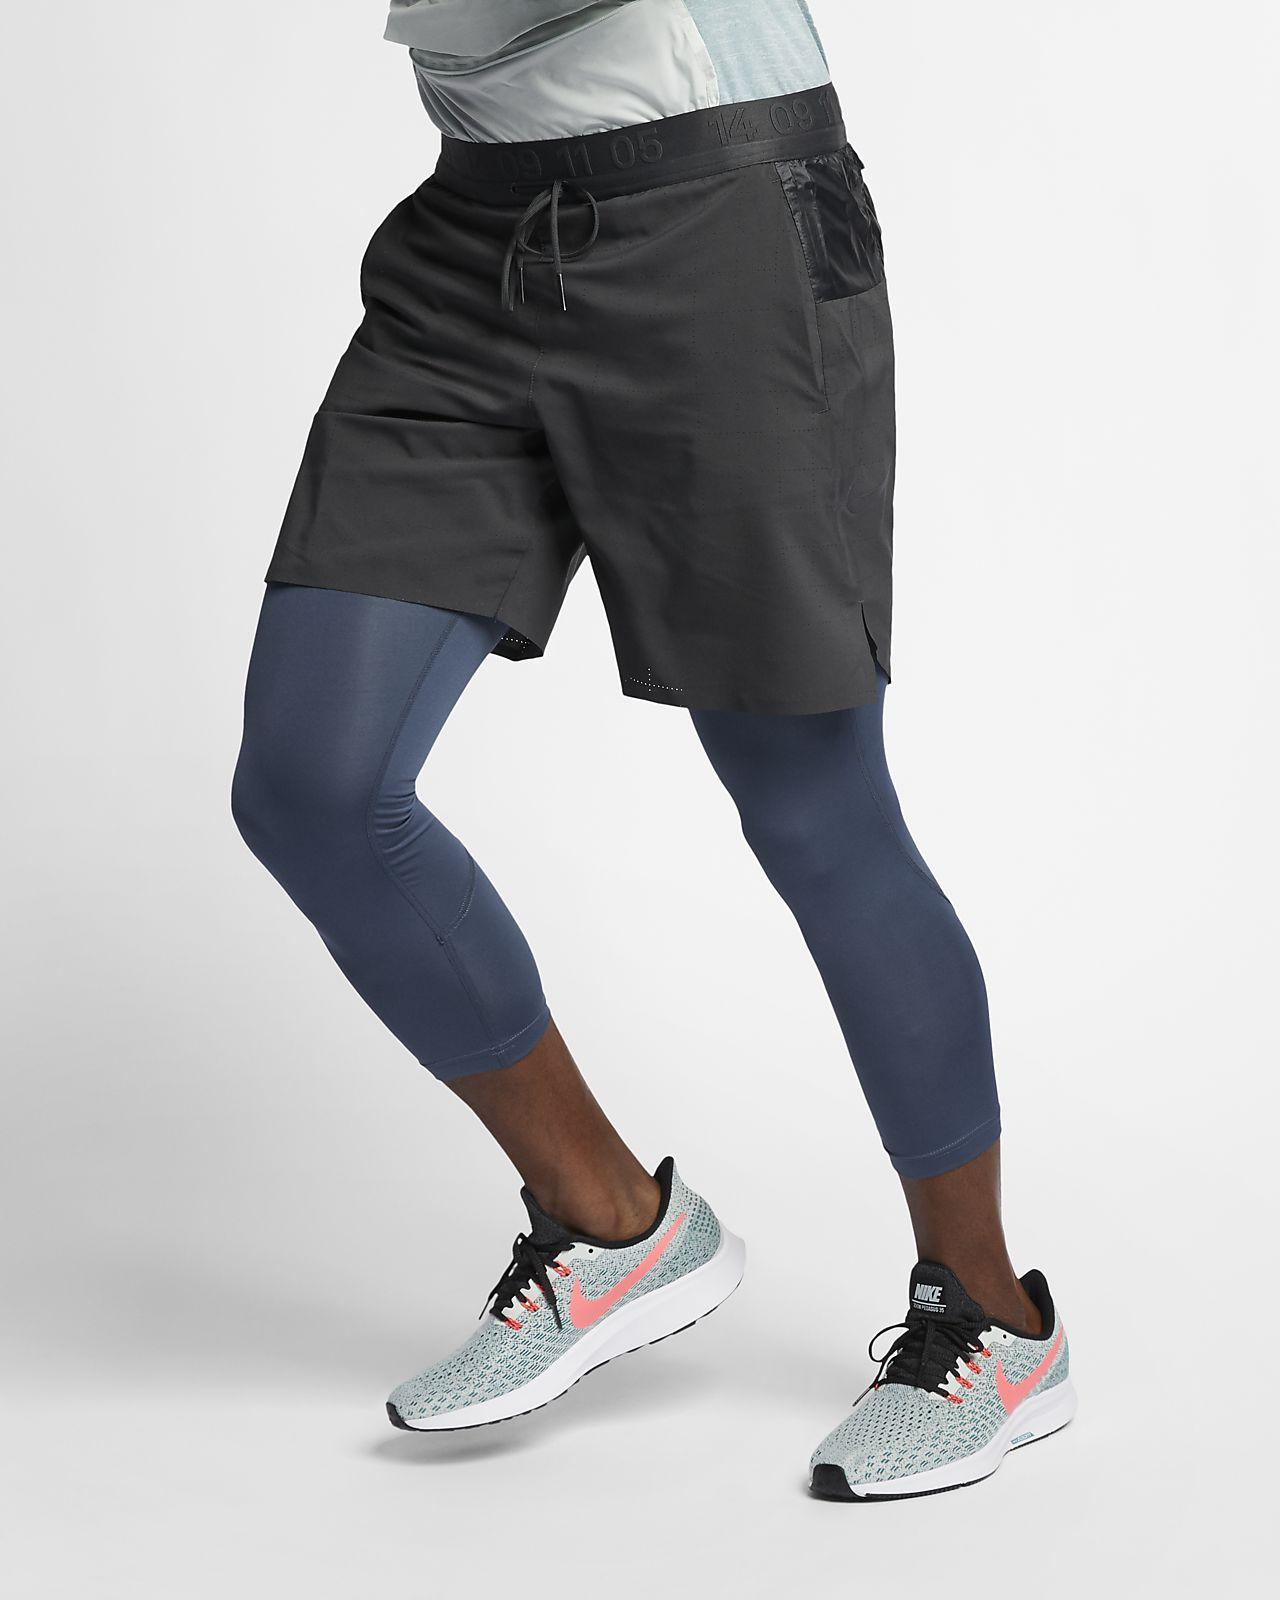 Nike Tech Pack 2 in 1 hardloopshorts voor heren